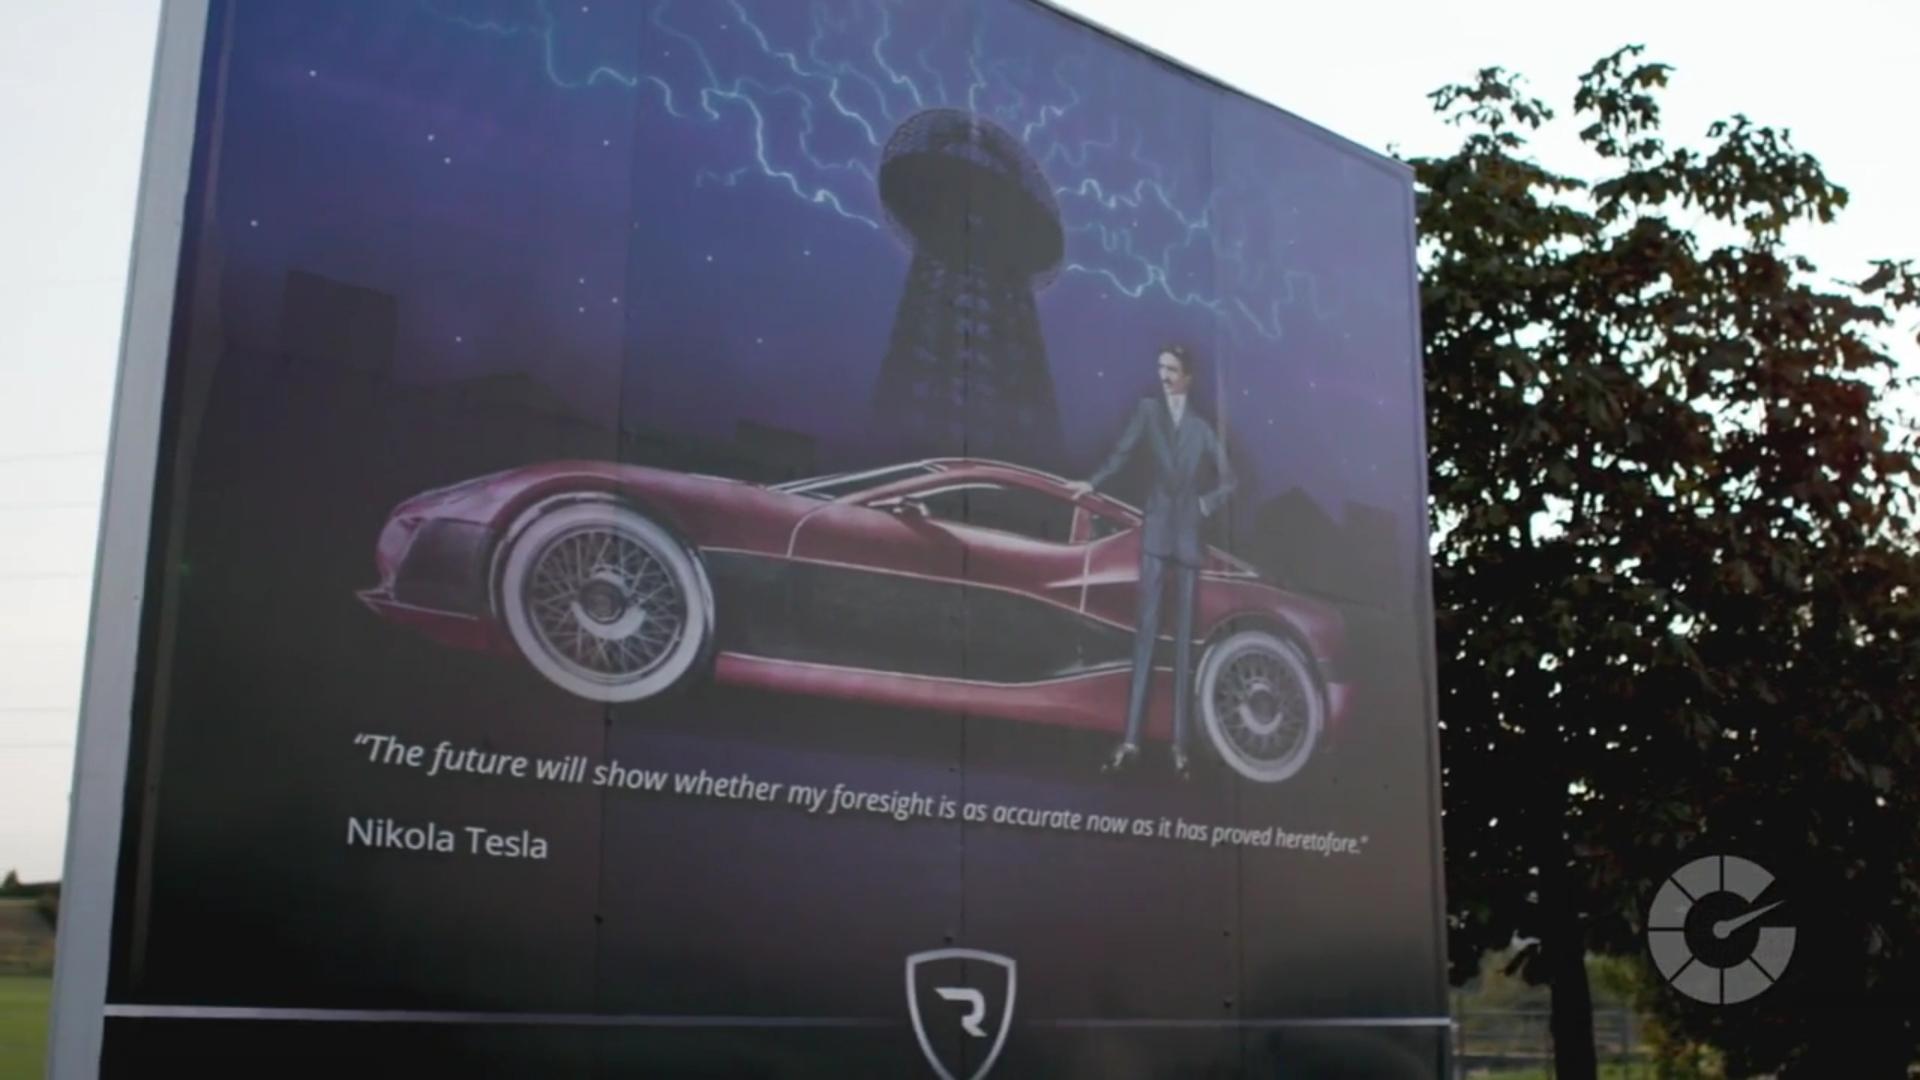 Nikola Tesla Rimac Billboard